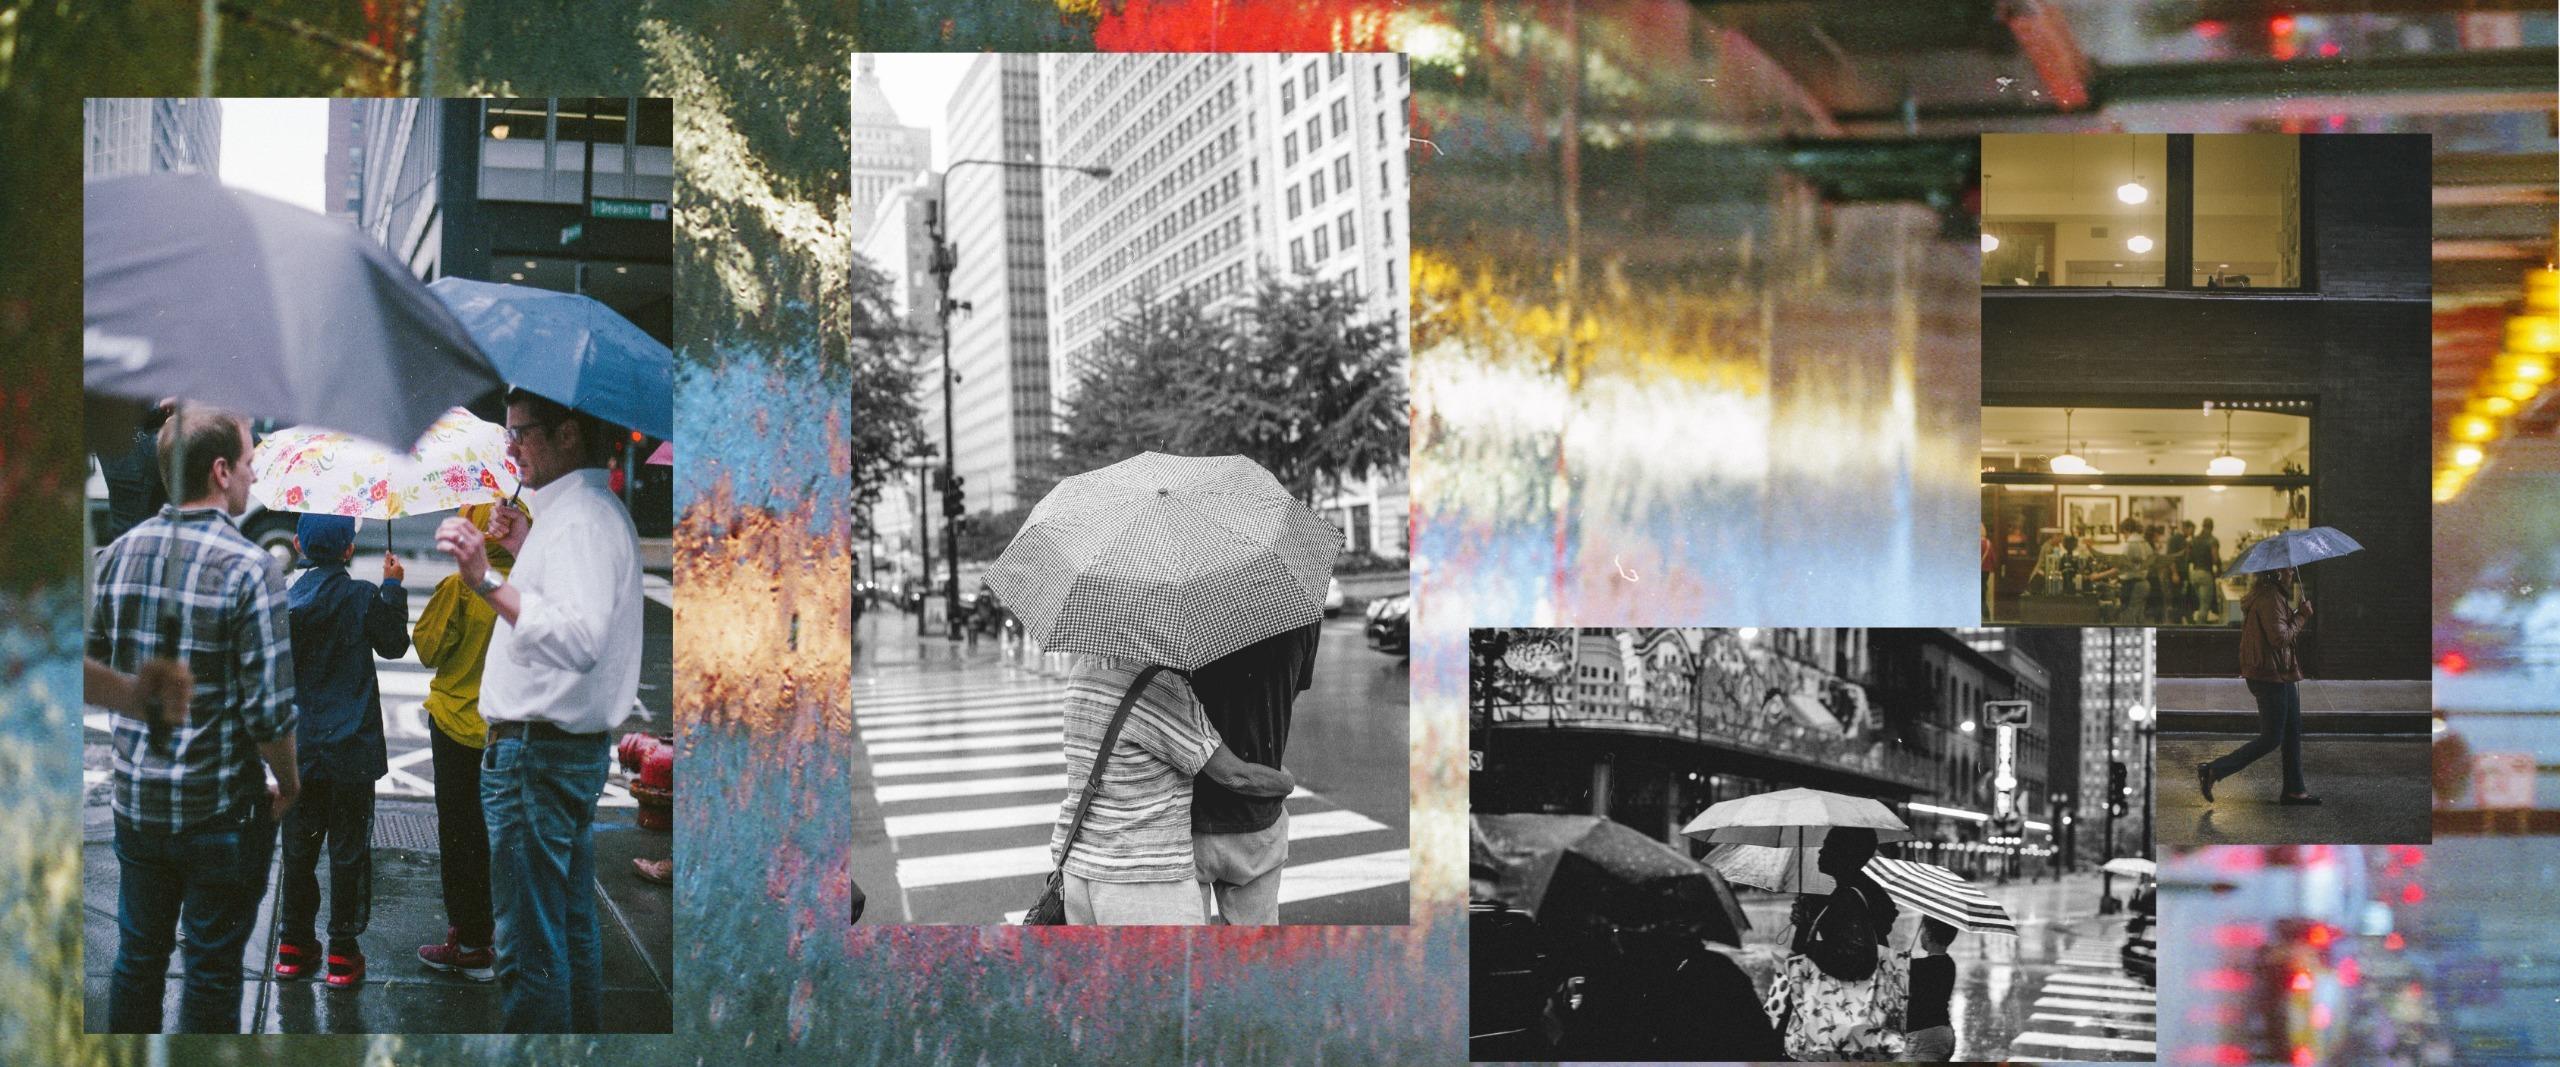 Patrick Lentz (@lentz) Cover Image